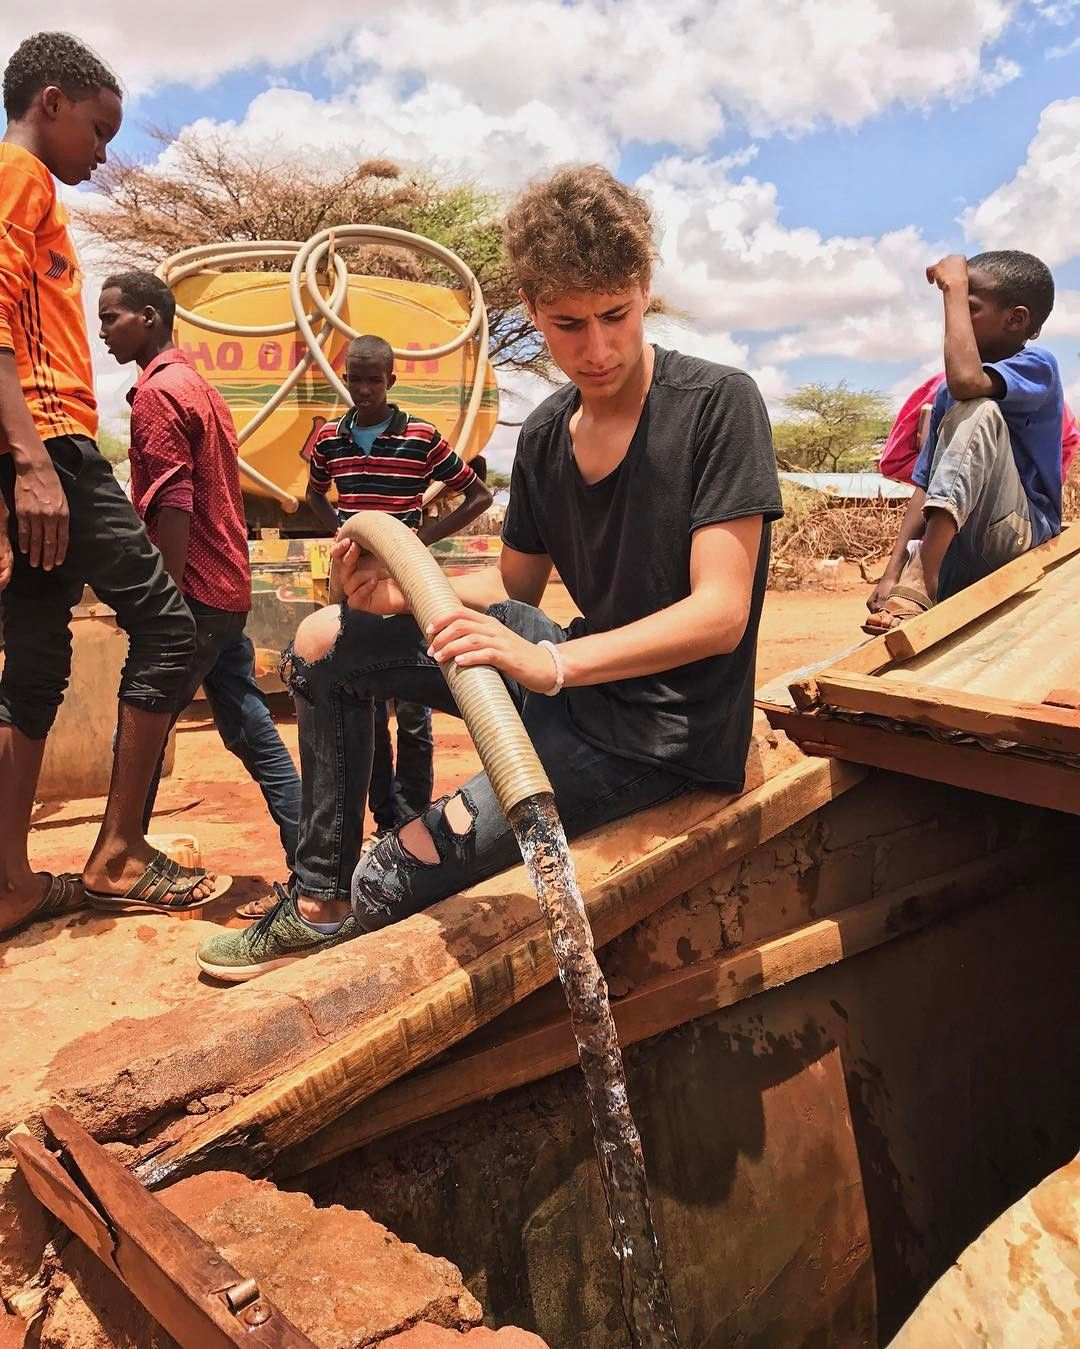 Juanpa Zurita Helping in Somalia